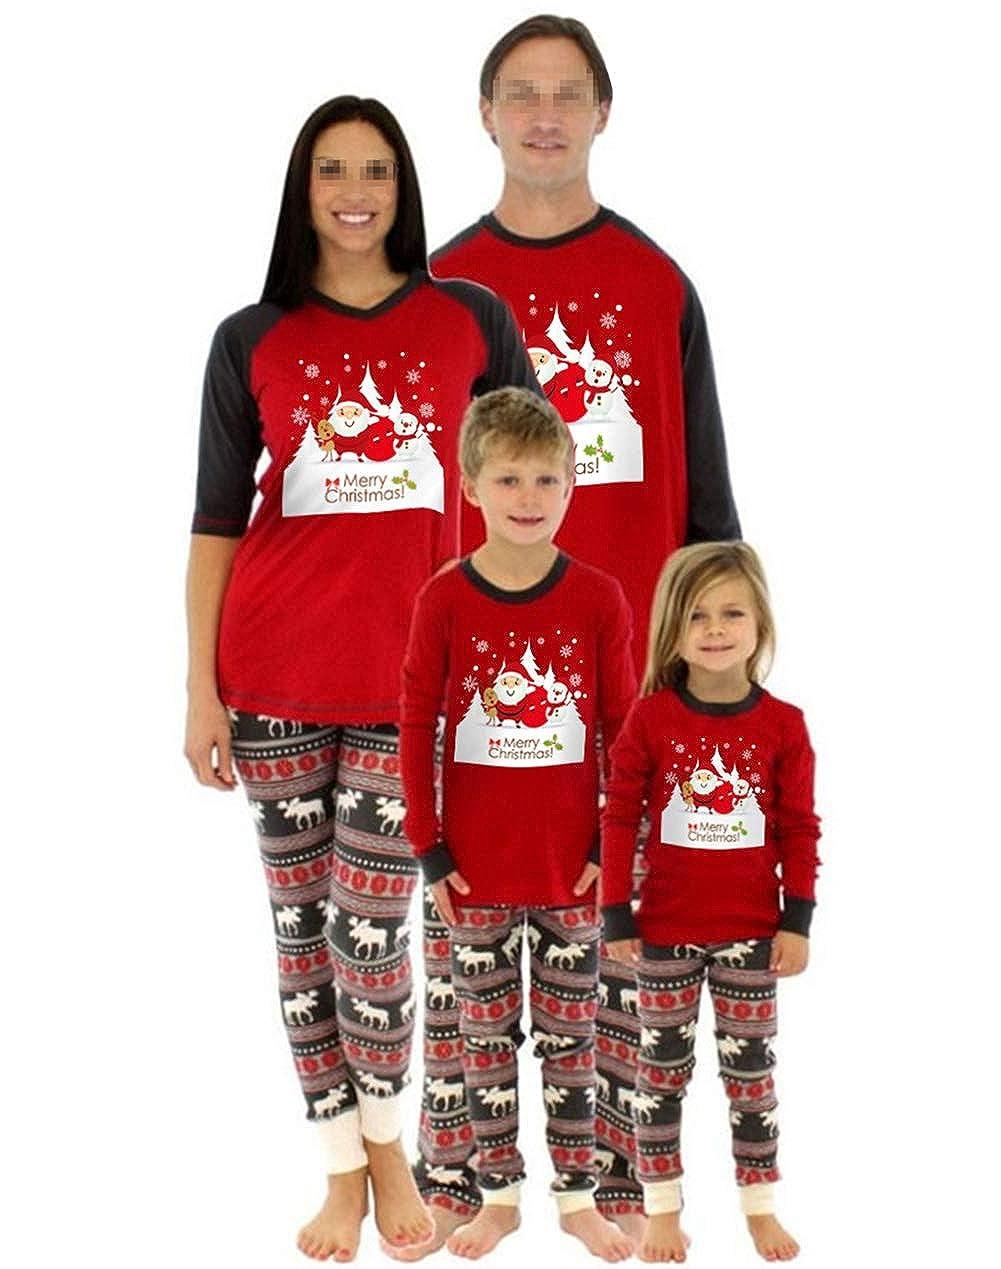 2Pcs Holiday Family Matching Christmas Pajamas Outfits Santa Deer Xmas Sleepwear Nightwear Homewear